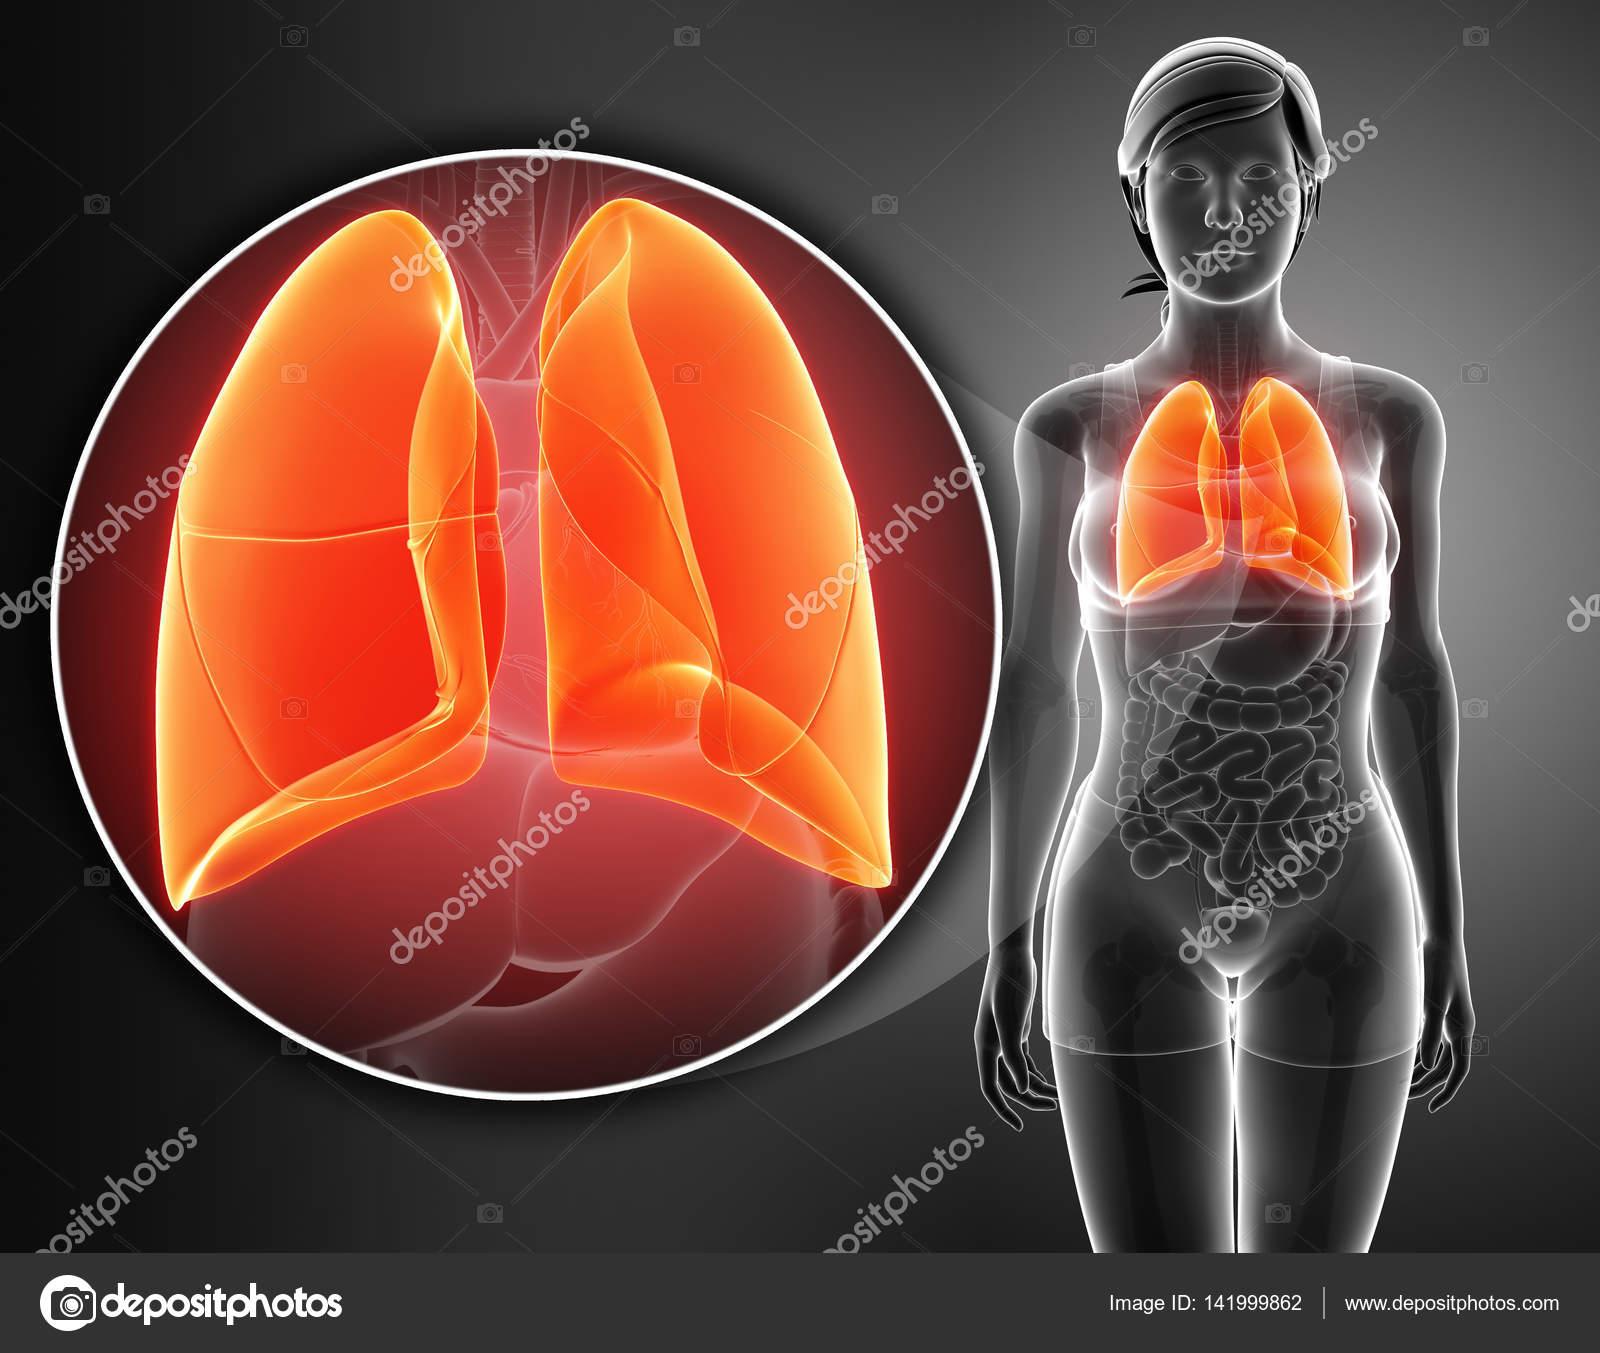 sistema respiratorio humano con pulmones — Foto de stock ...